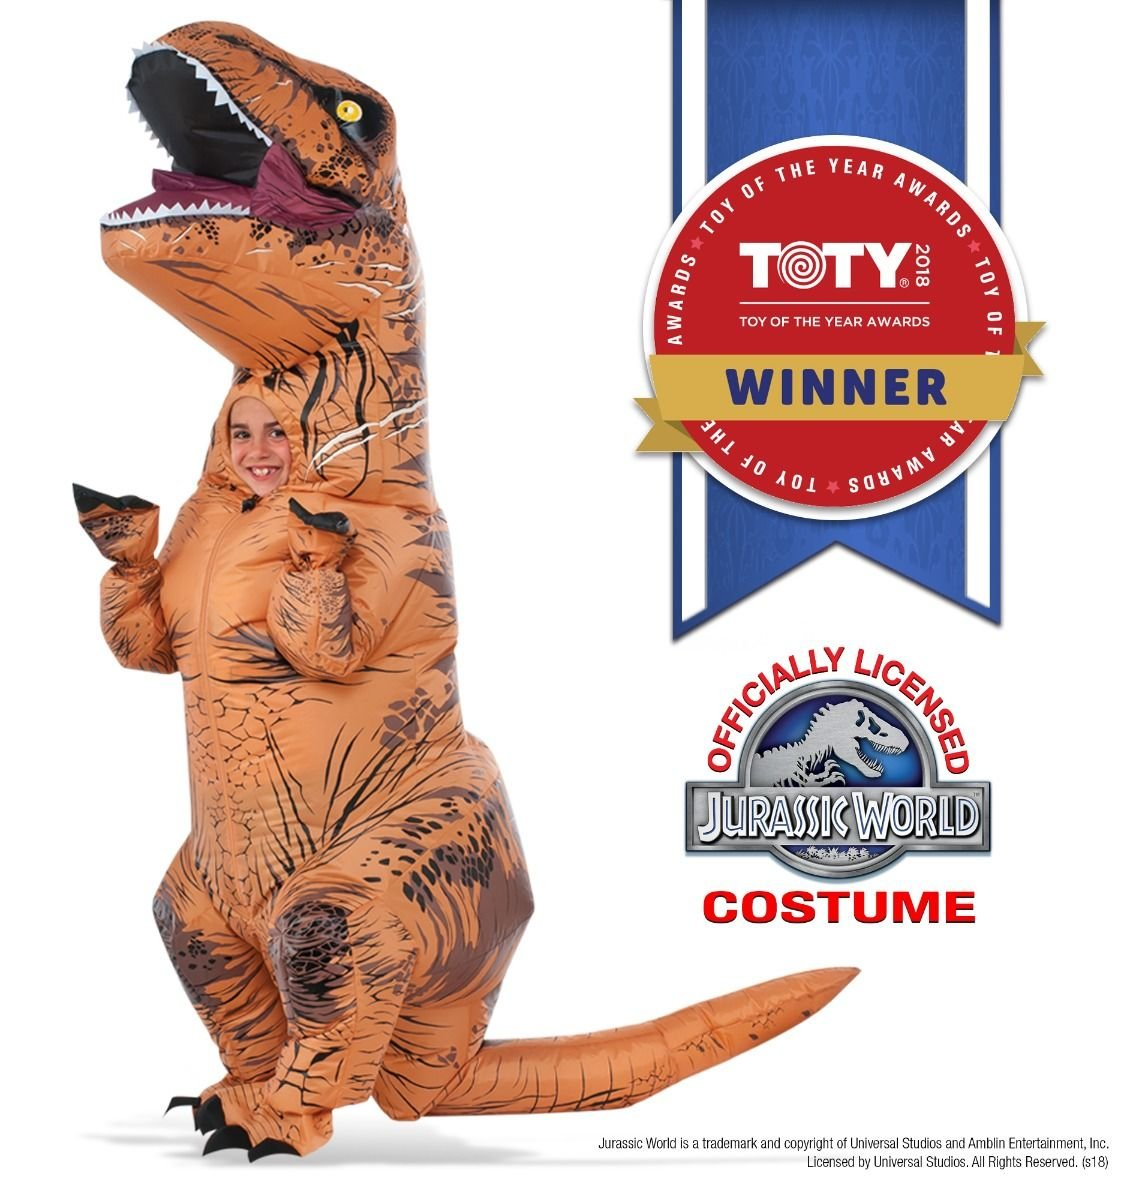 Rubies Costume Jurassic World T-Rex Inflatable Child Costume for 5 to 7 Years old Rubies Costume Co (Canada) I-610821STD